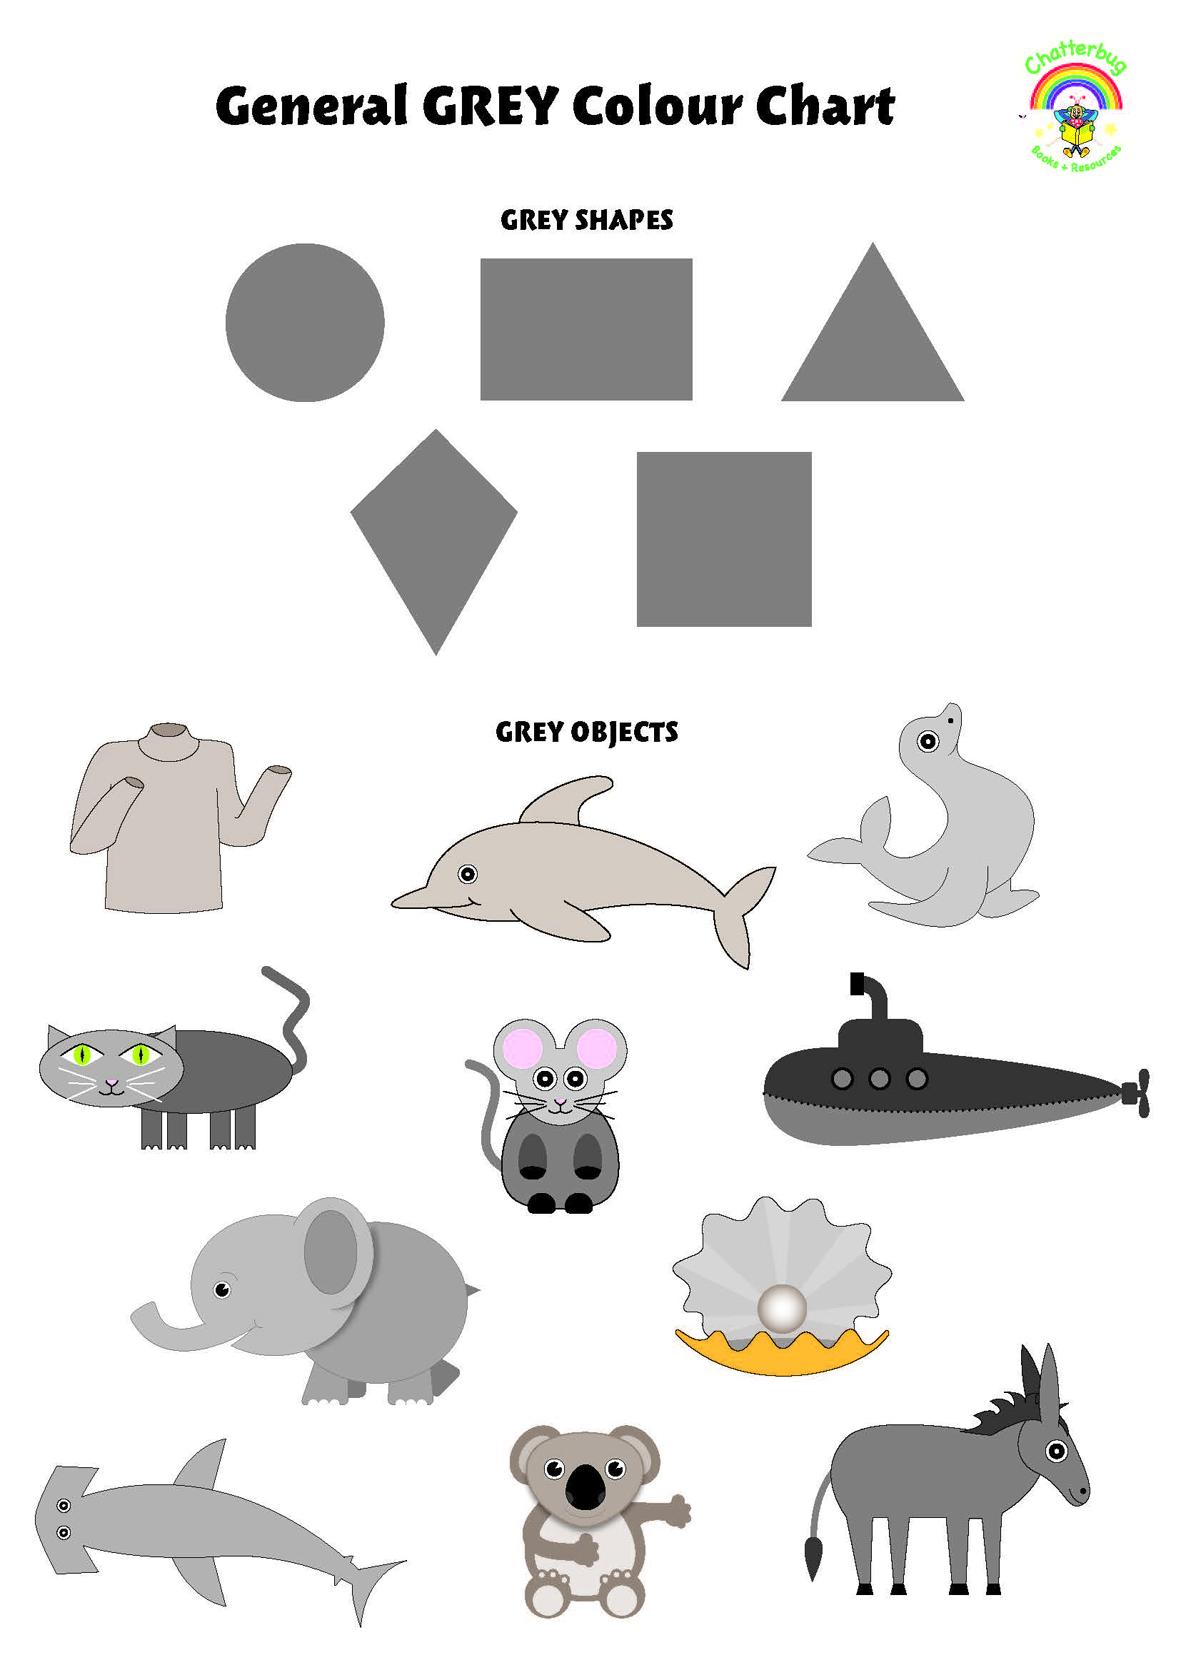 Grey Colour Chart